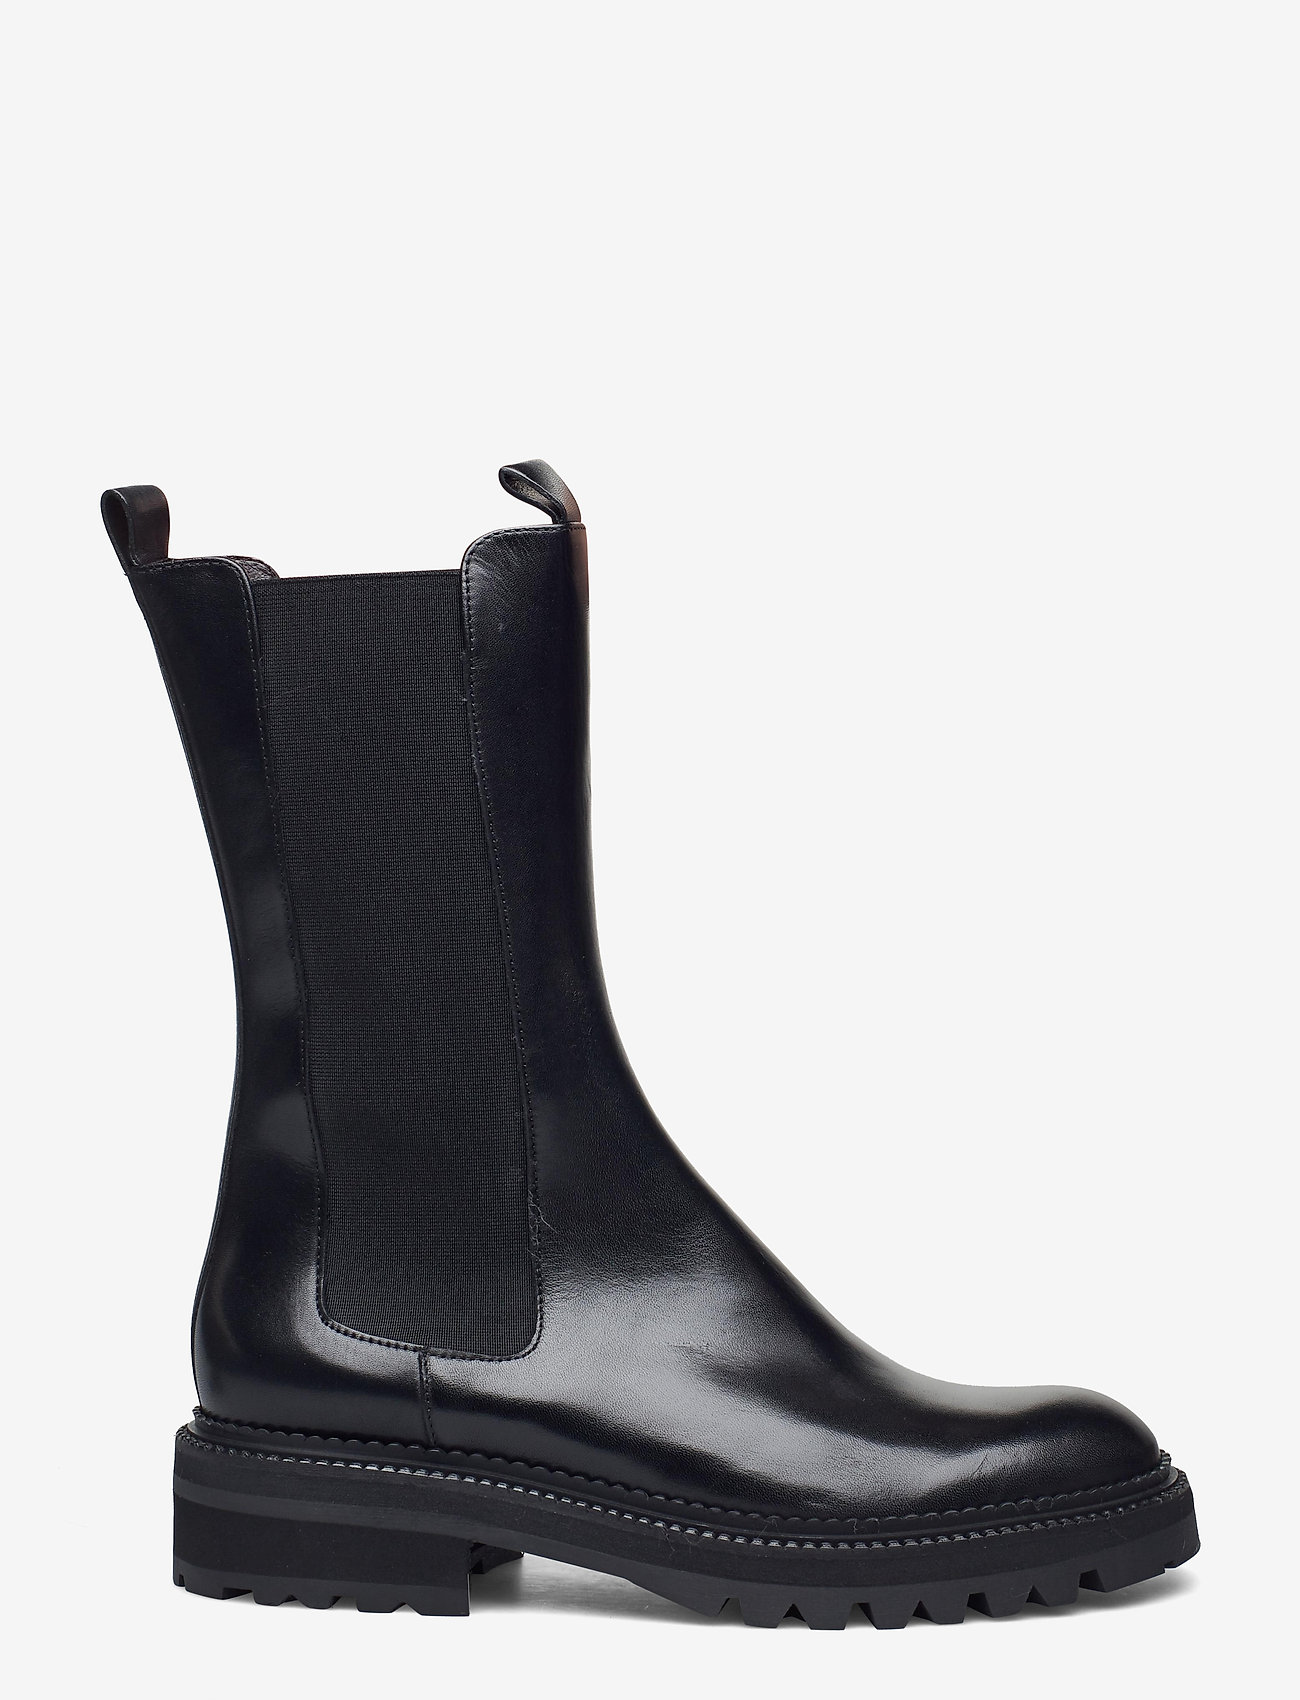 Billi Bi - Boots 4808 - black calf 80 - 1